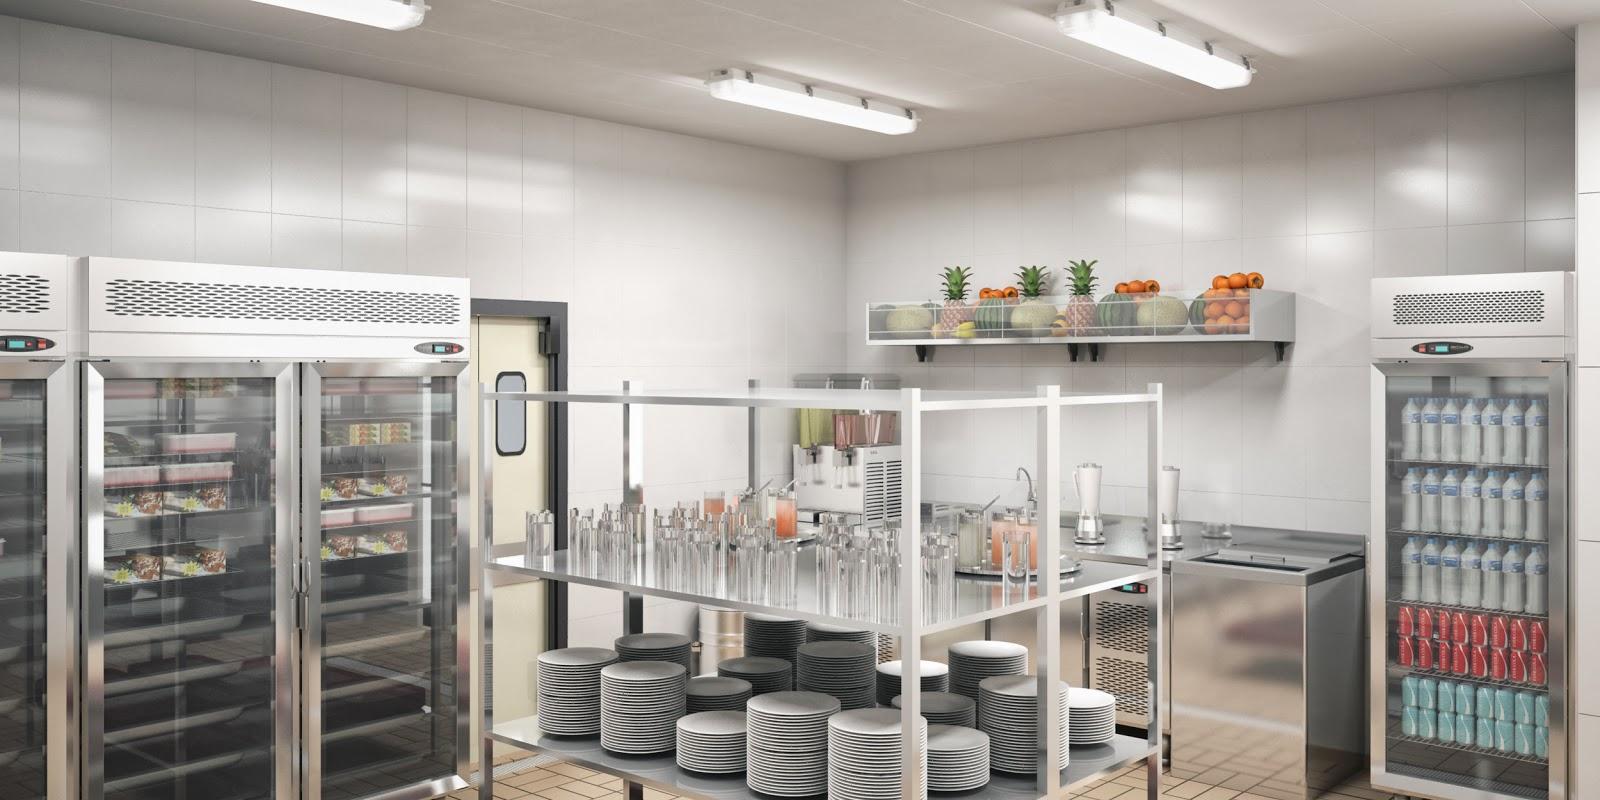 Projeto Cozinha Industrial Autocad Pmscrapbooking Com Id Ias De